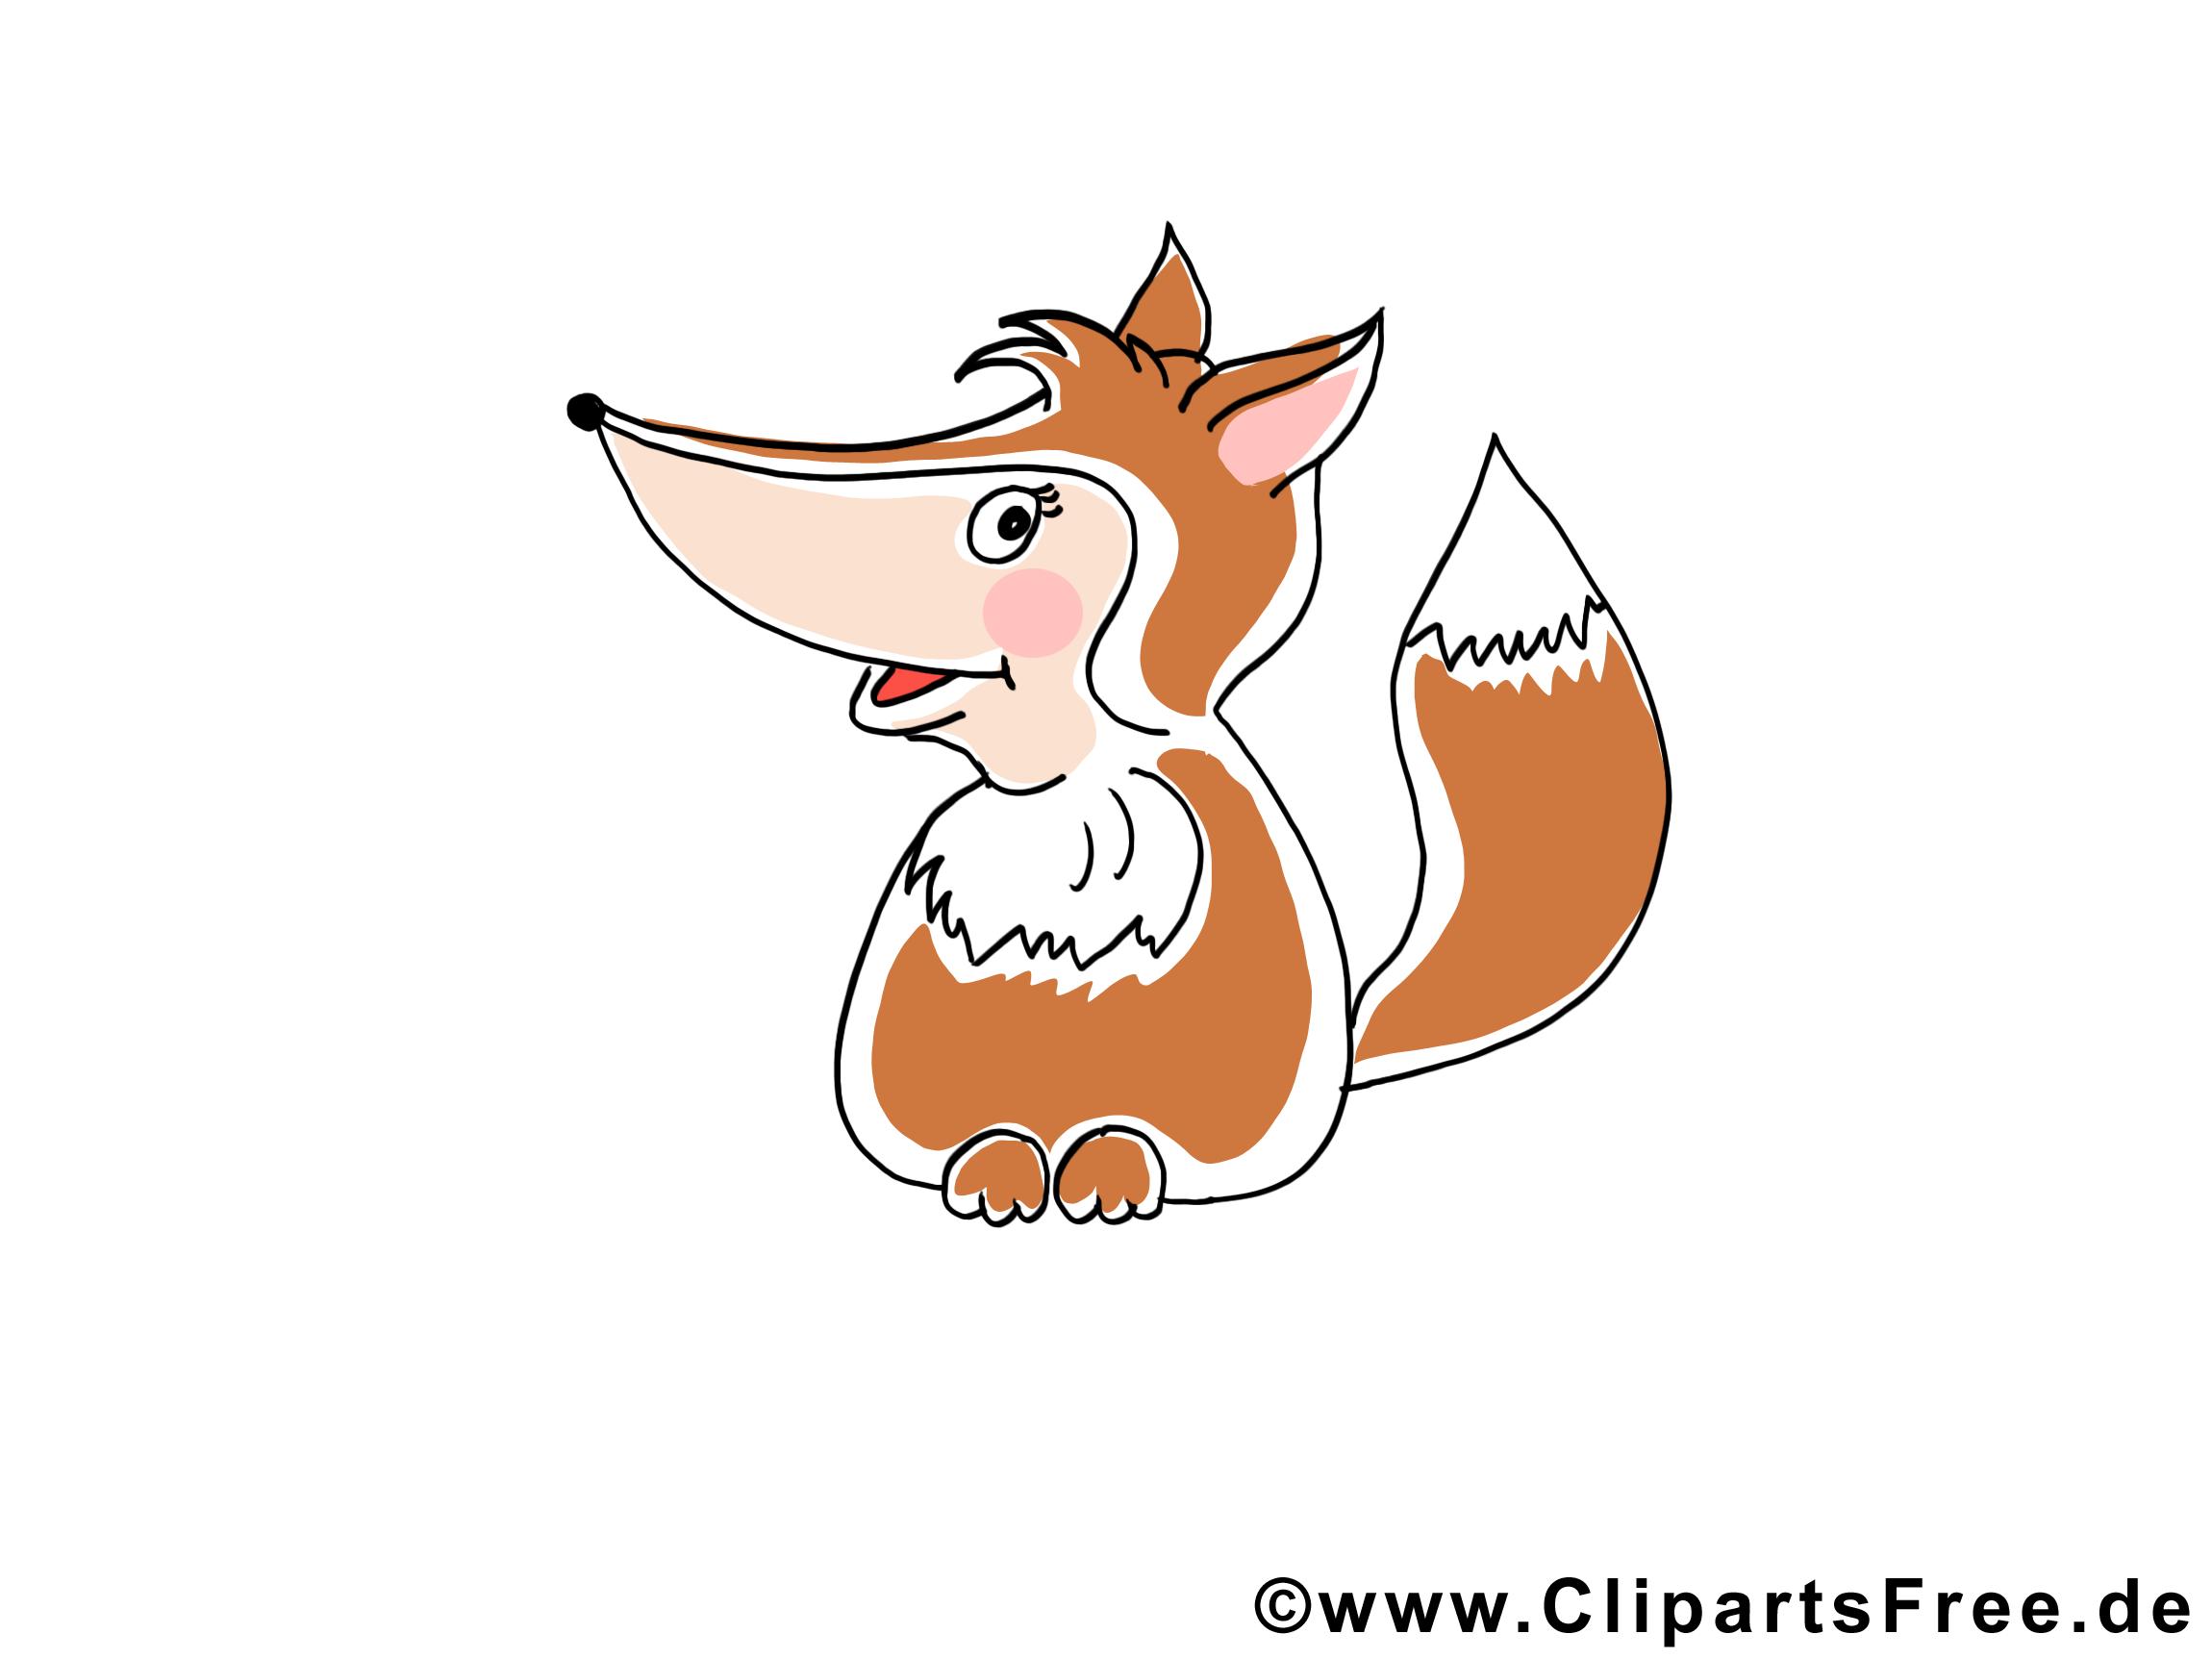 Renard cliparts gratuis – Animal images